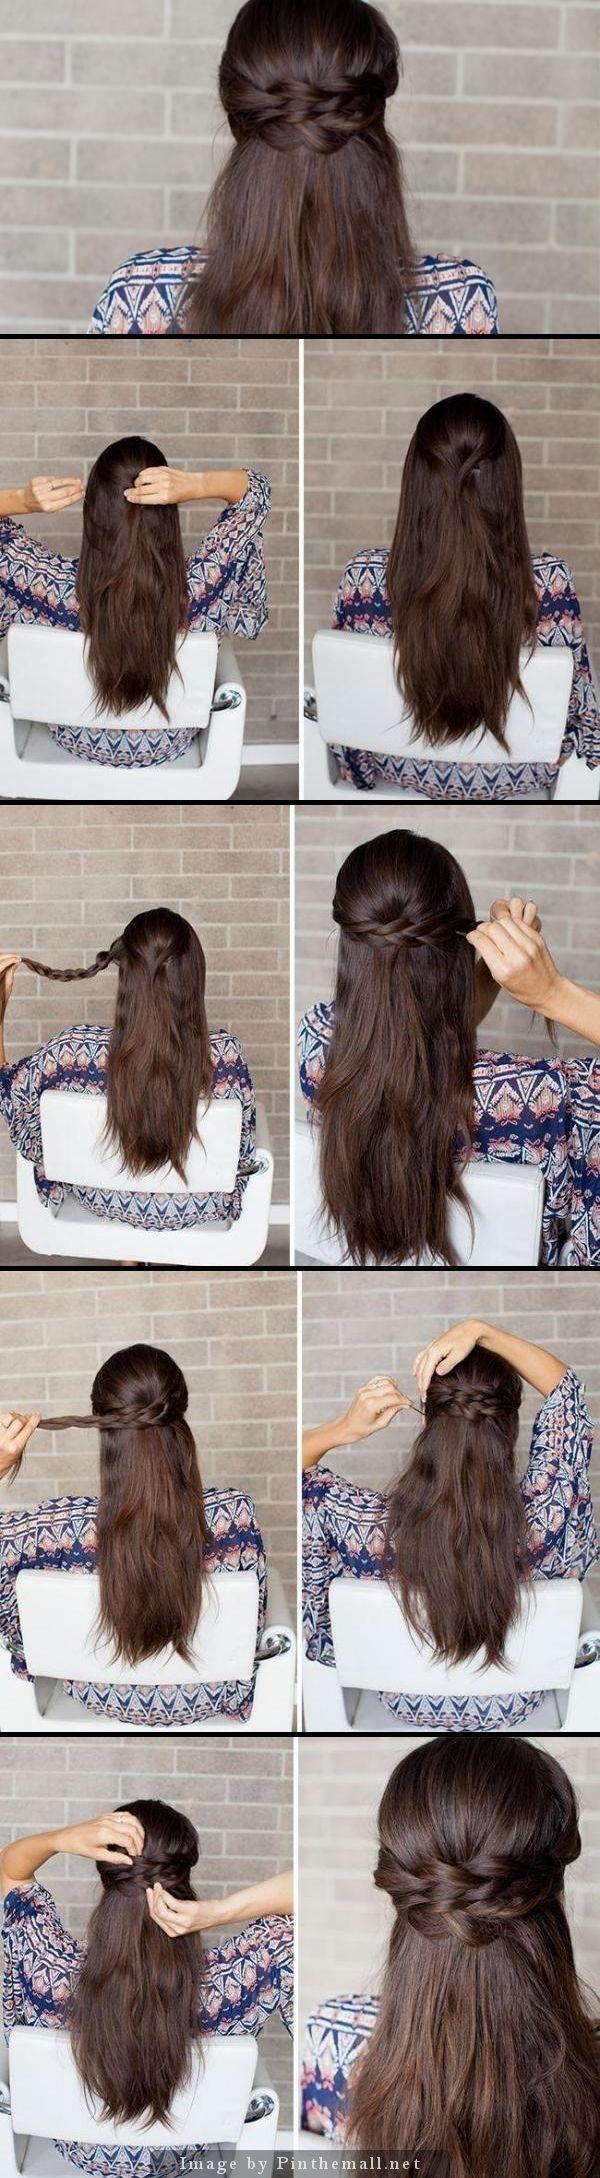 Half Up Half Down Hairstyle hair long hair diy hair hairstyles hair tutorials easy hairstyles